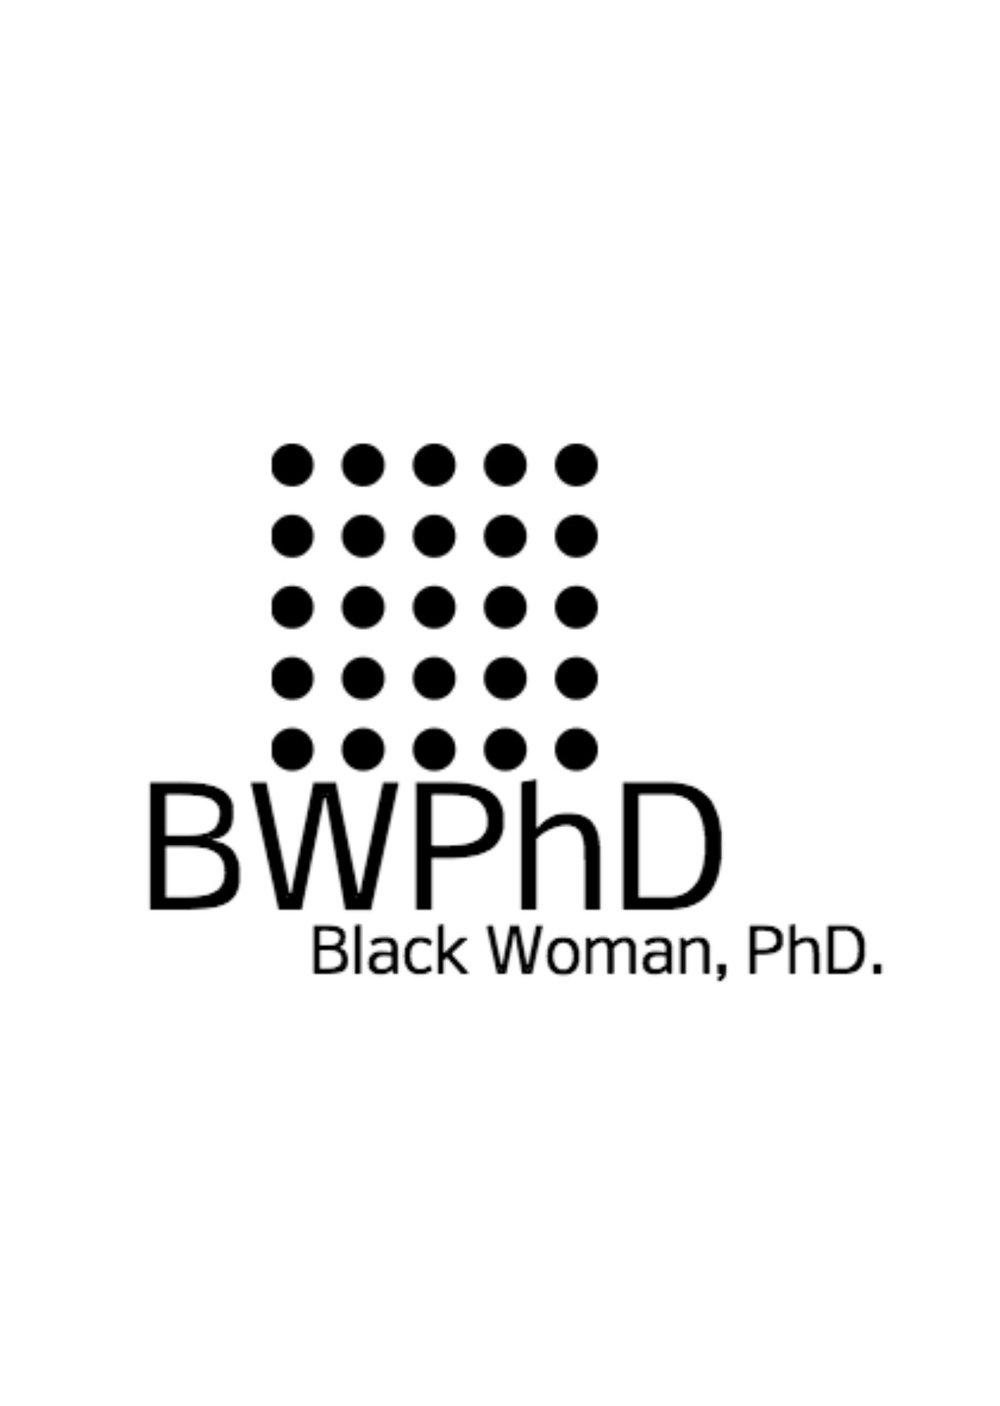 BWPhD.jpg